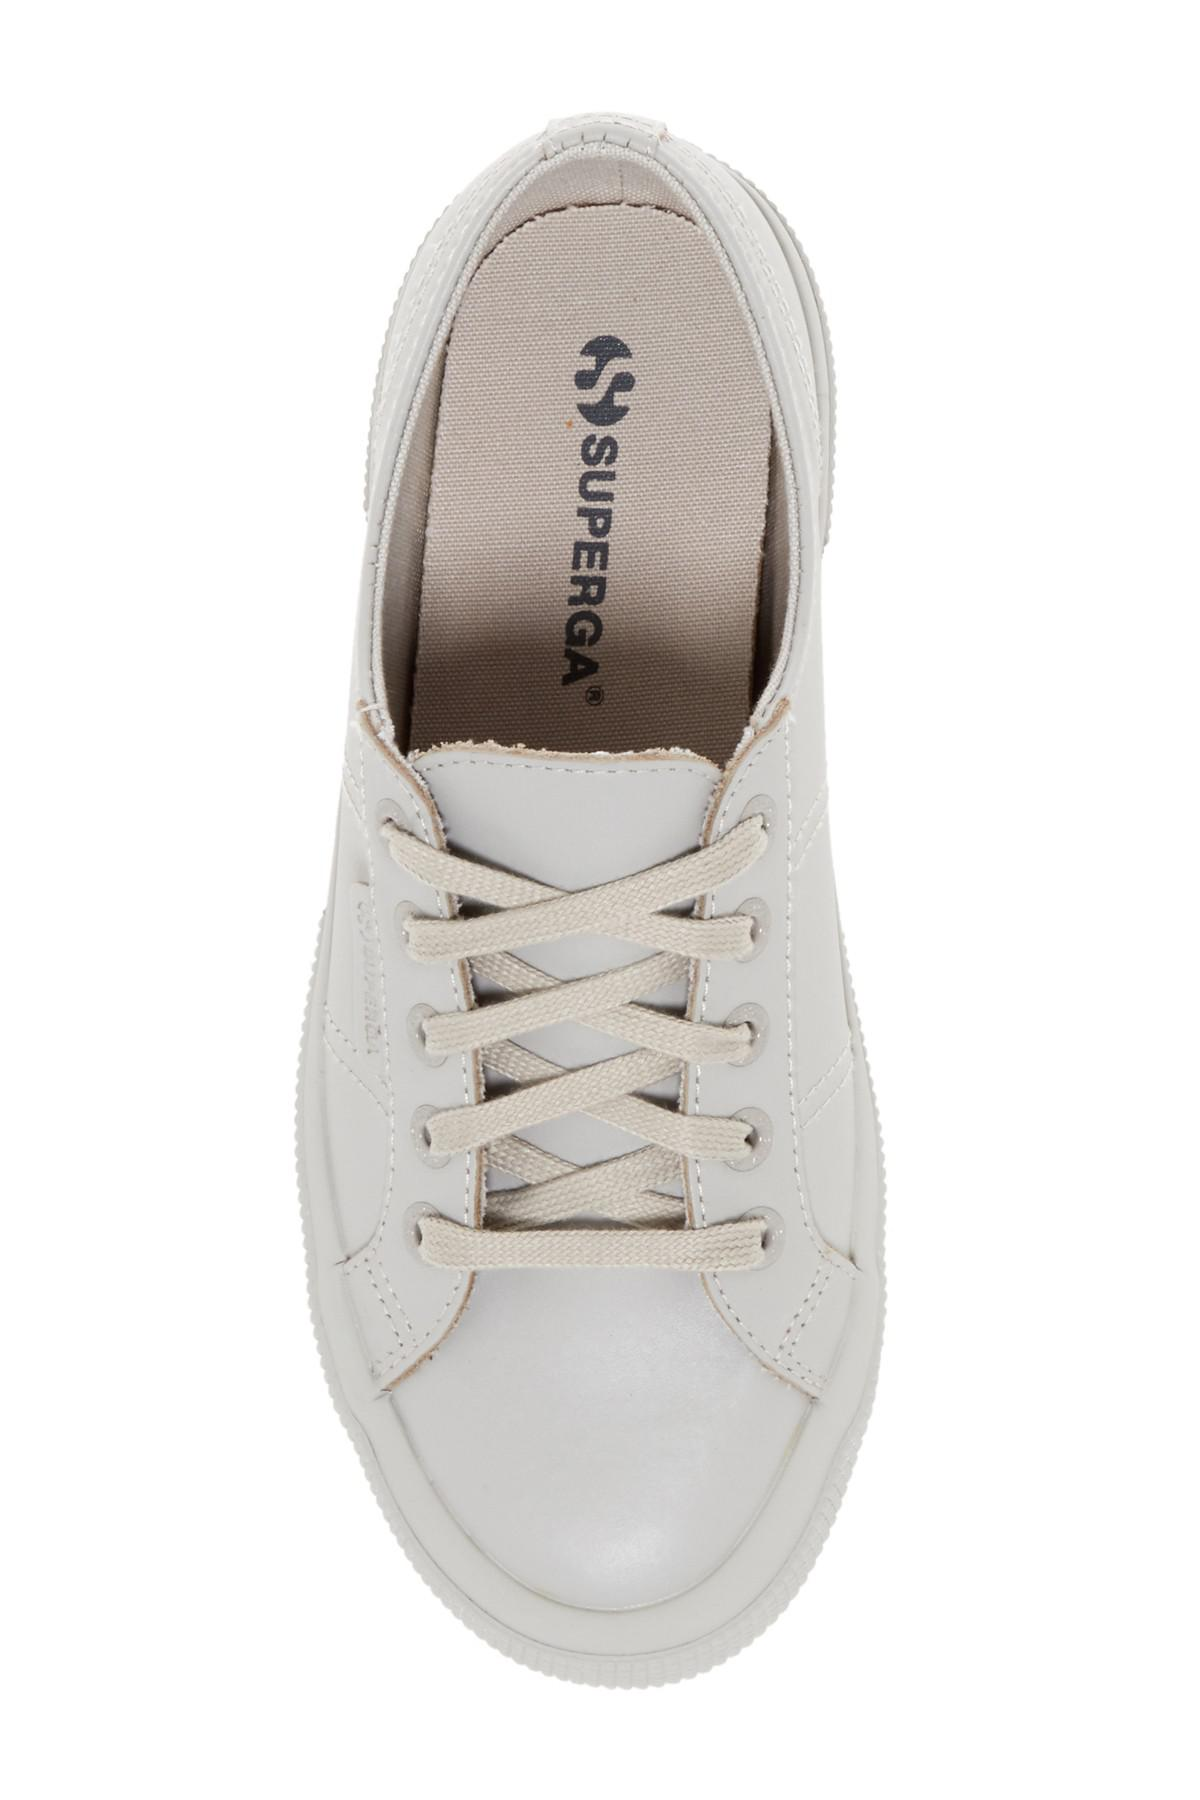 Superga Fantasia Leather Sneaker in